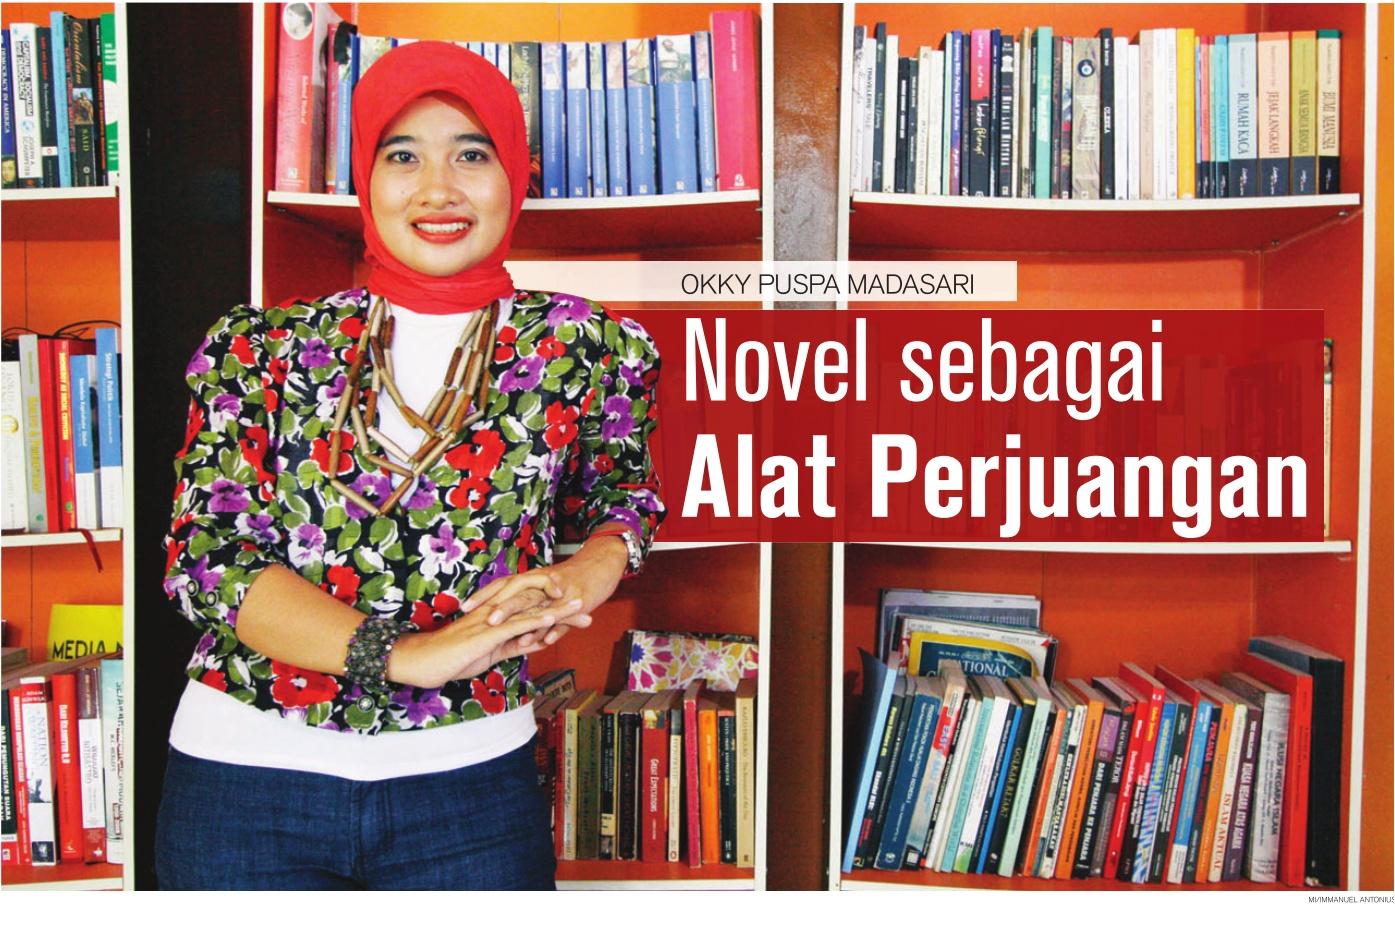 Okky Madasari, novel sebagai alat perjuangan